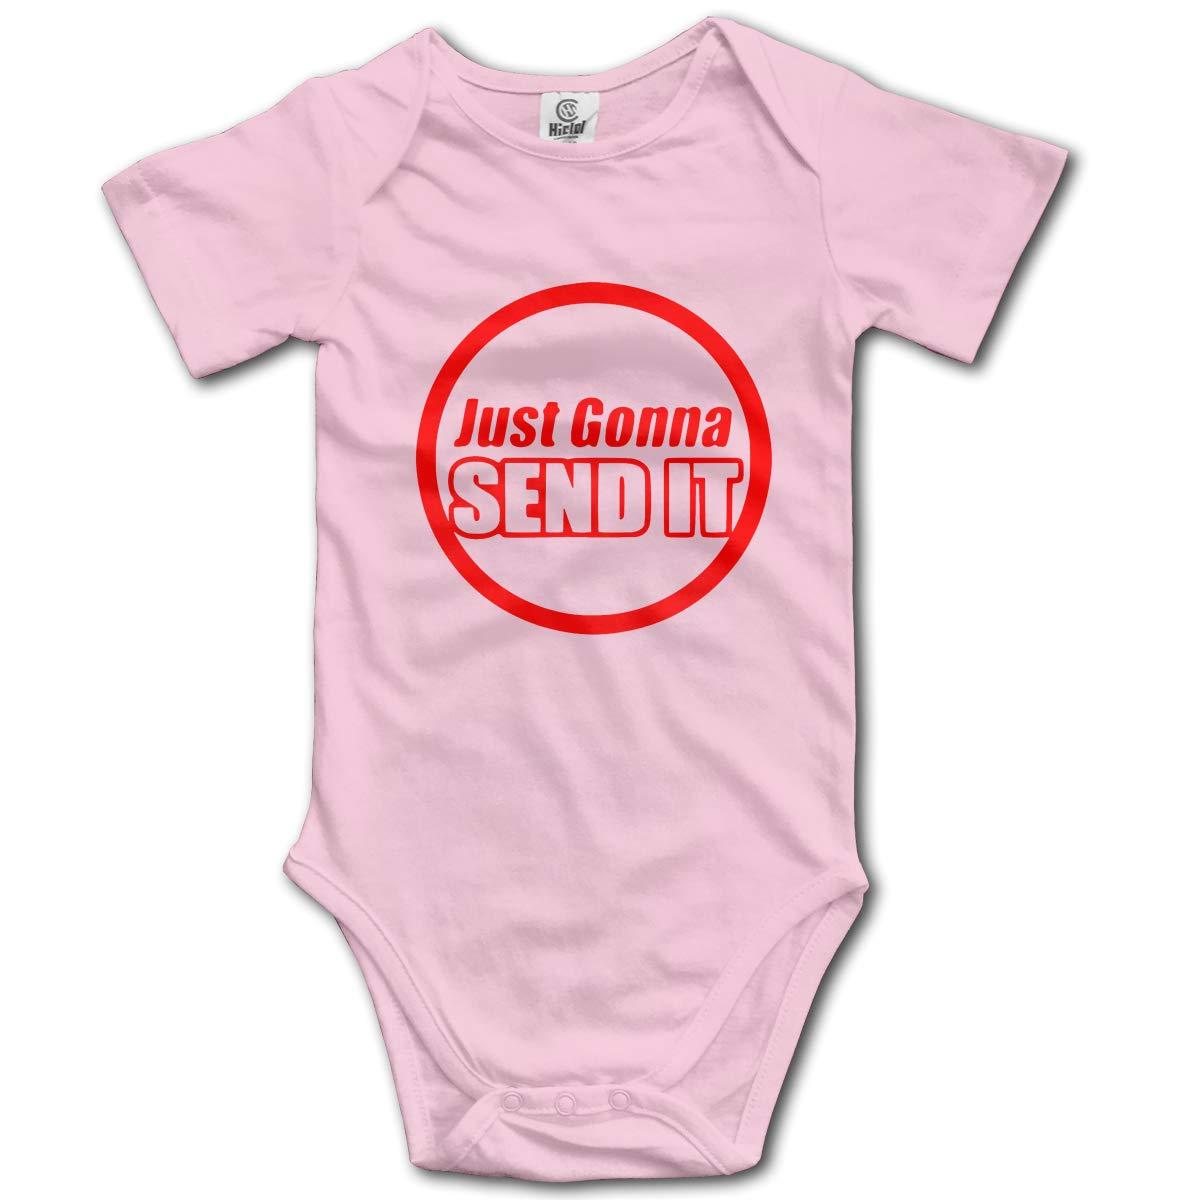 Coollifea Just Gonna Send It Baby Romper 0-18 Months Newborn Baby Girls Boys Layette Rompers Black